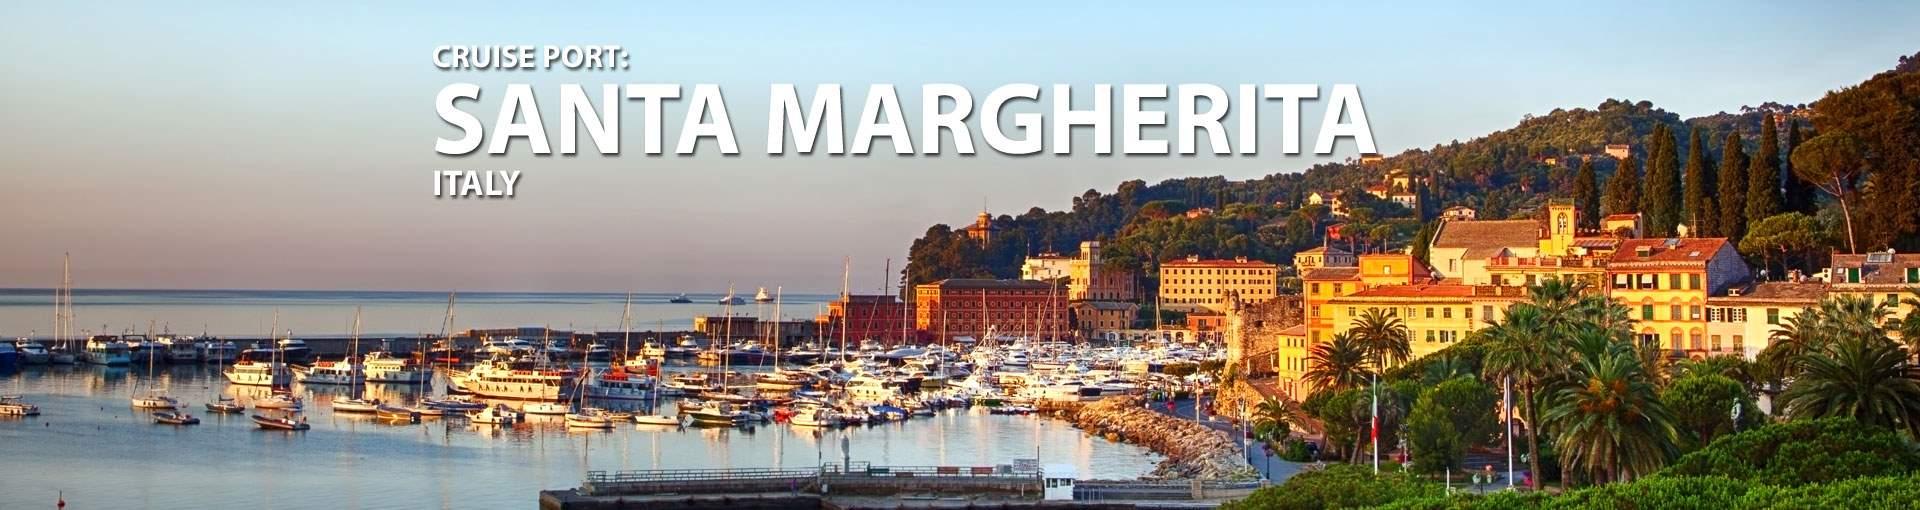 Cruises to Santa Margherita, Italy